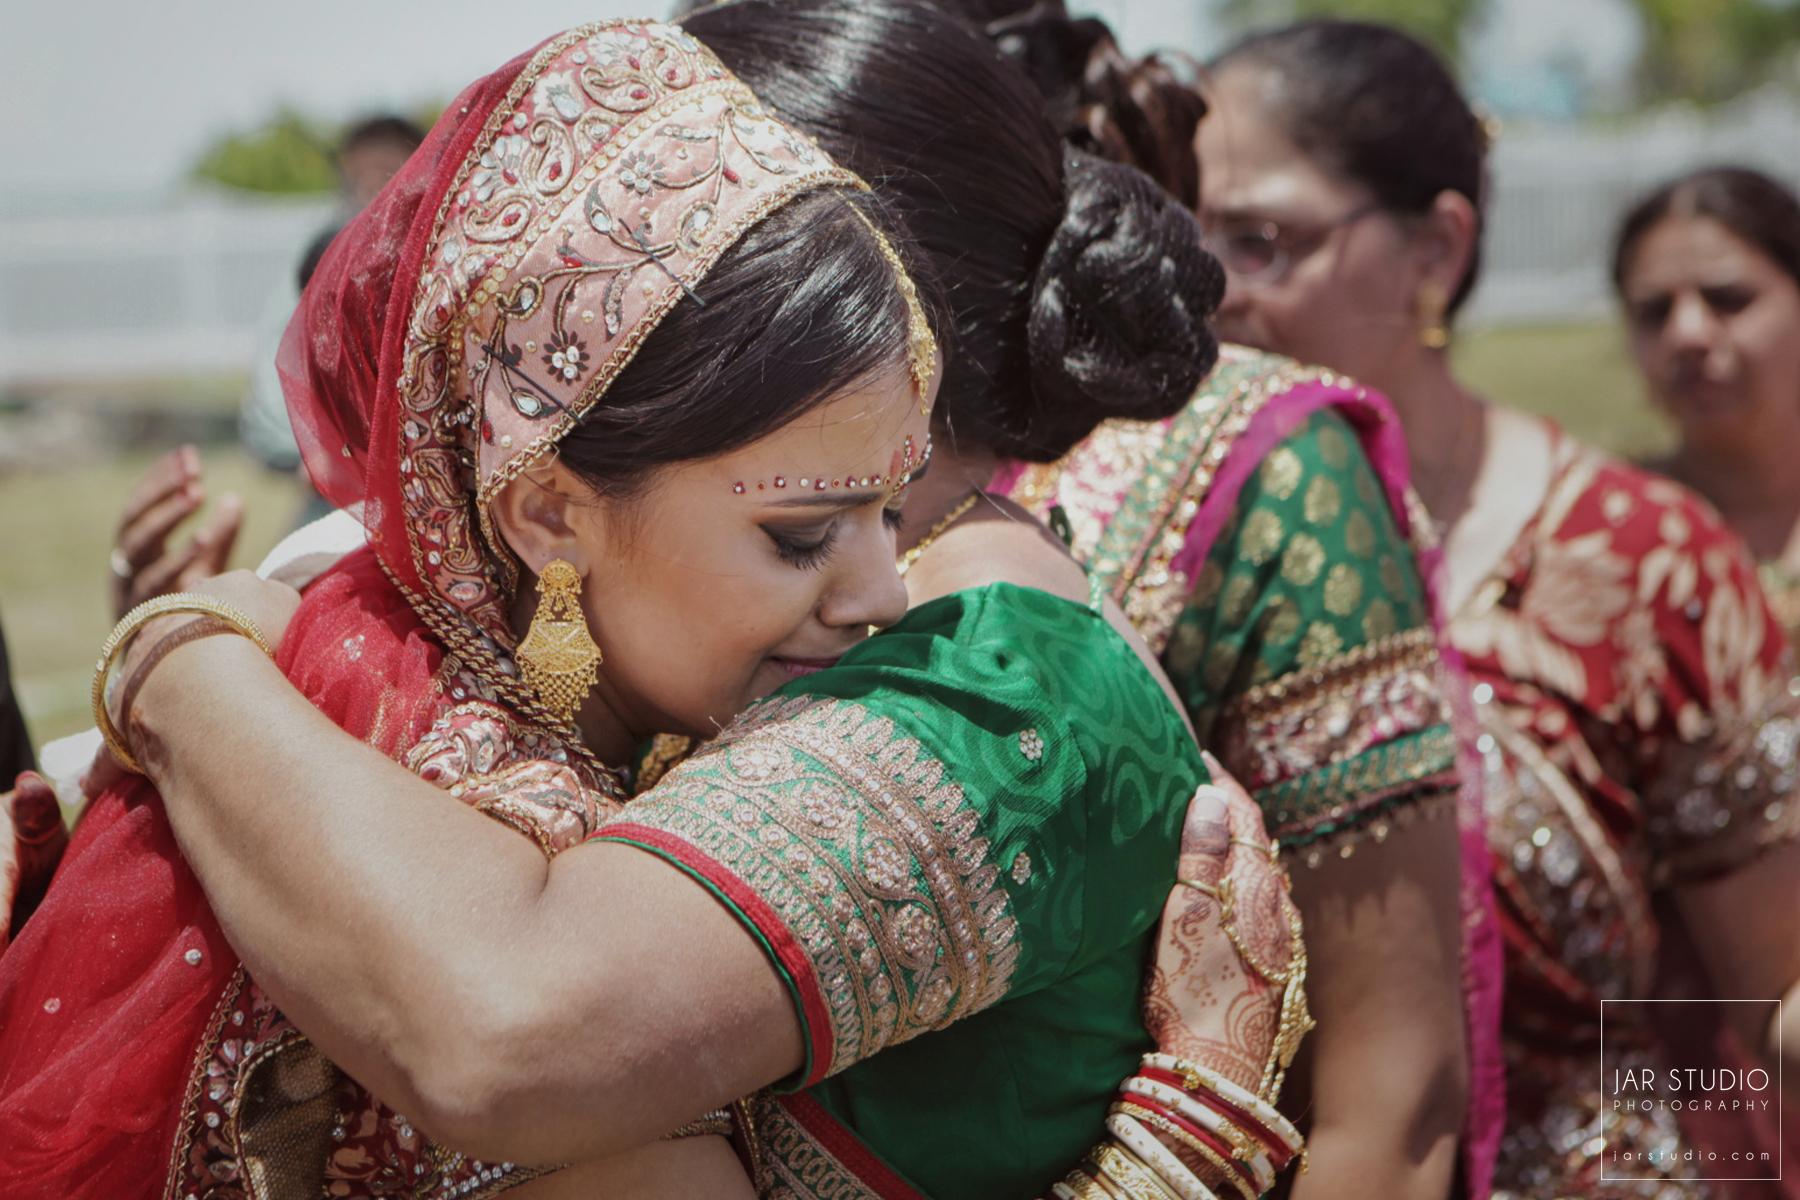 44-indian-bride-mom-wedding-jarstudio-photography-florida.JPG